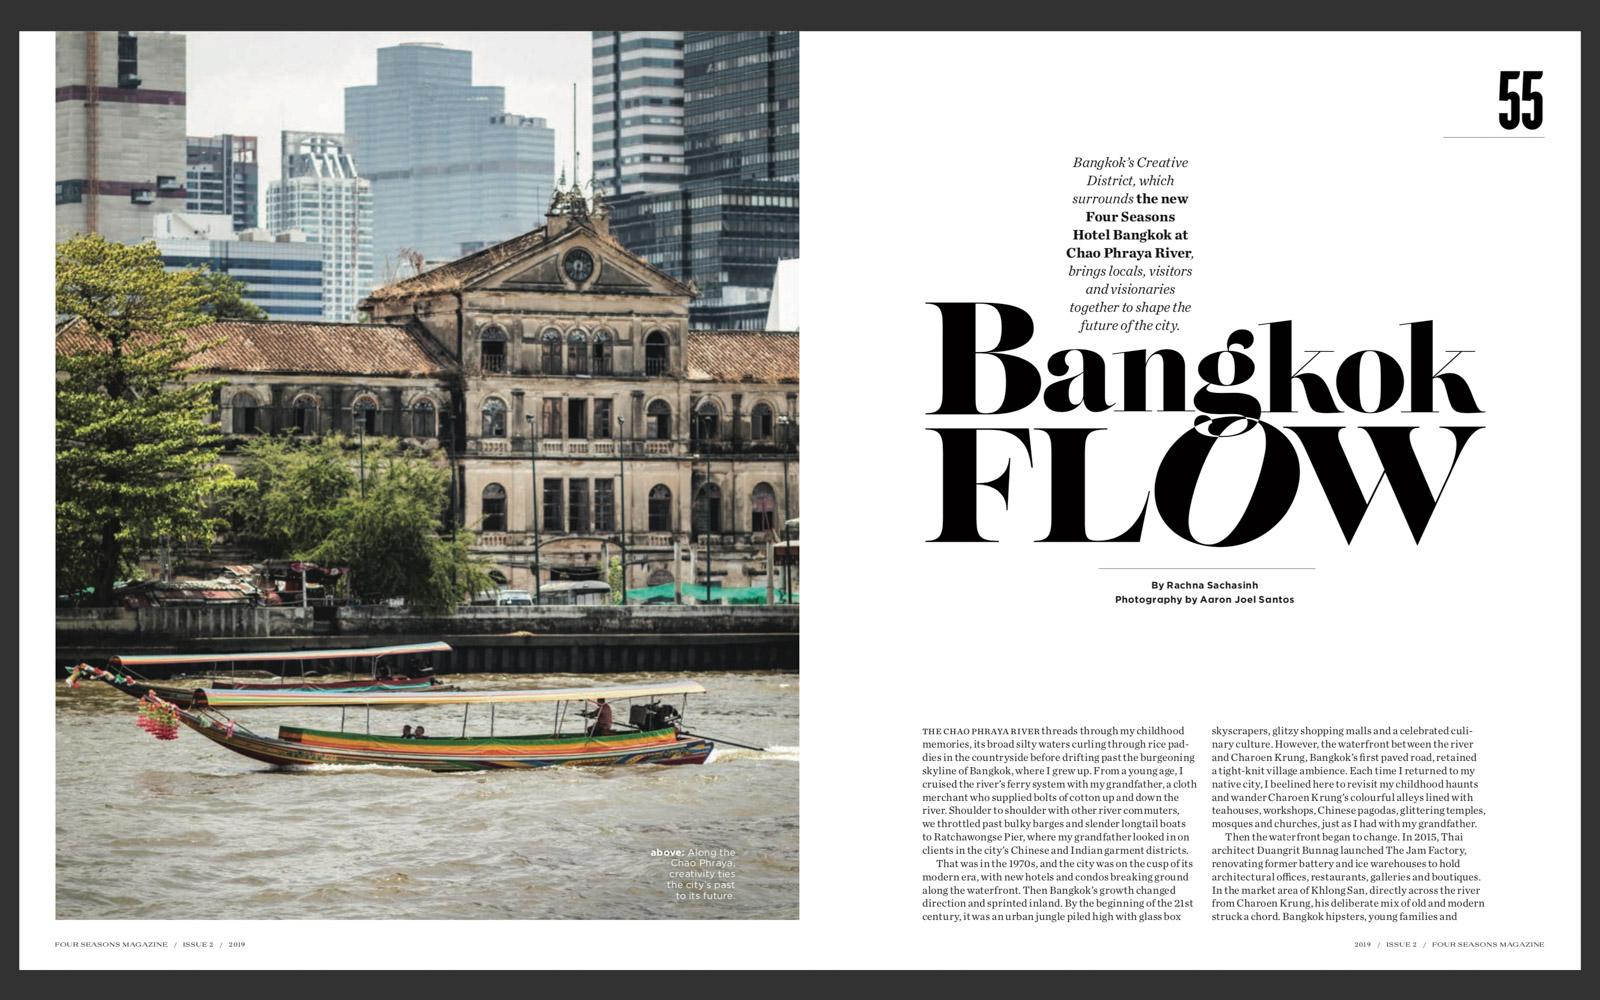 Aaron Joel Santos | Travel Photographer | Thailand | Asia